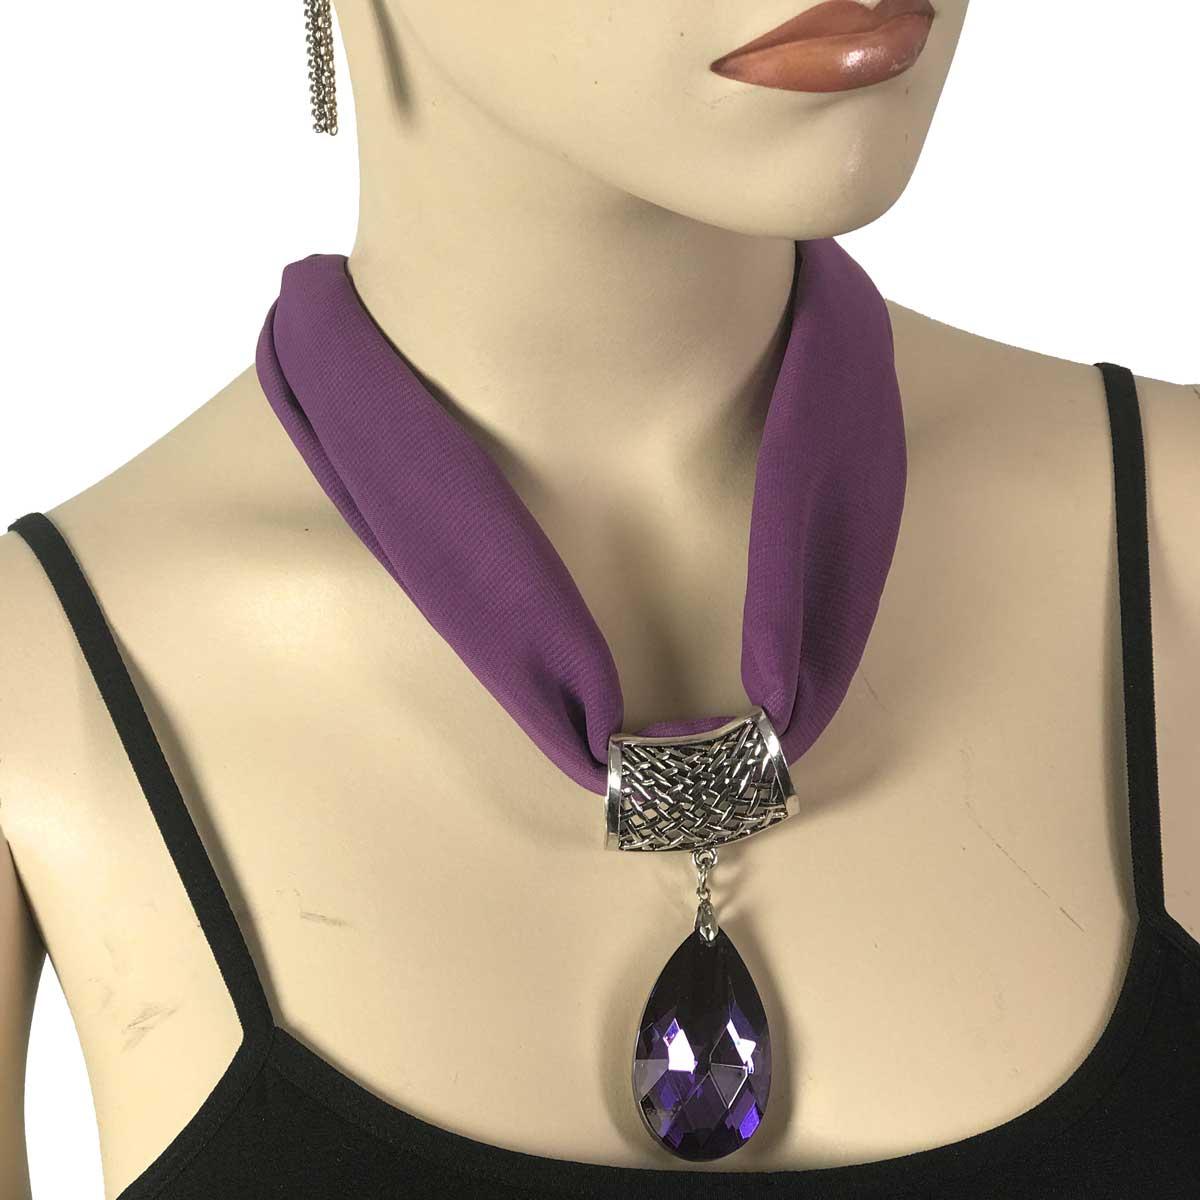 Chiffon Magnet Necklace w/ Optional Pendant